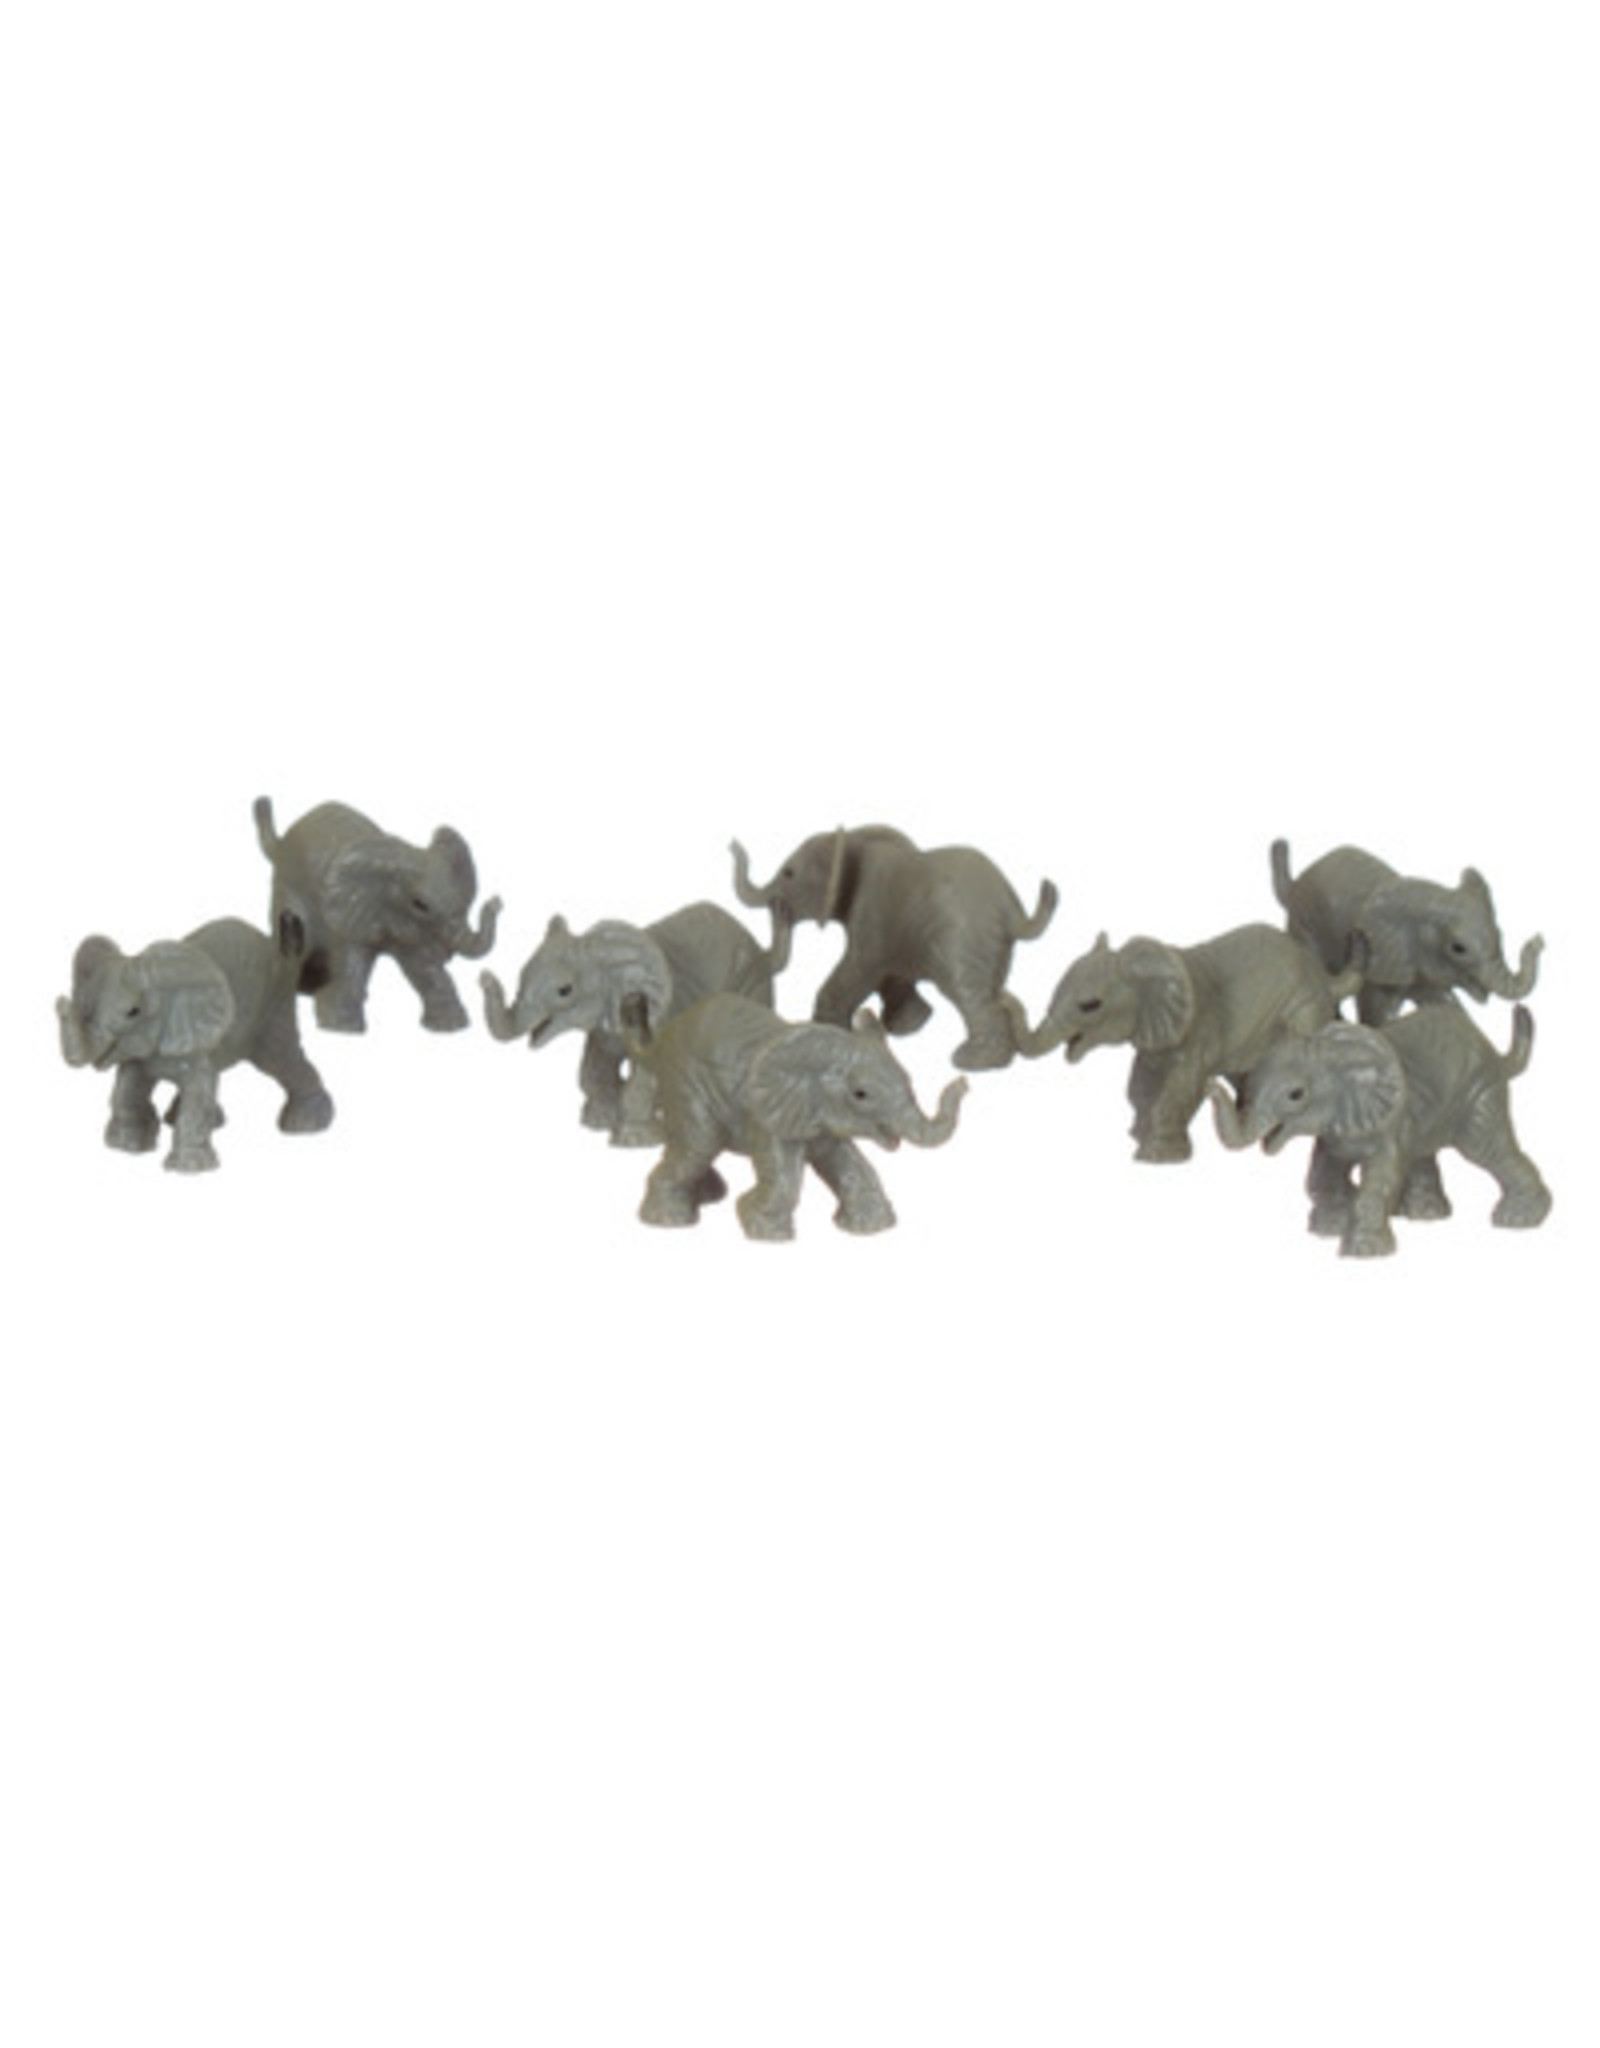 Goodluck mini - olifant